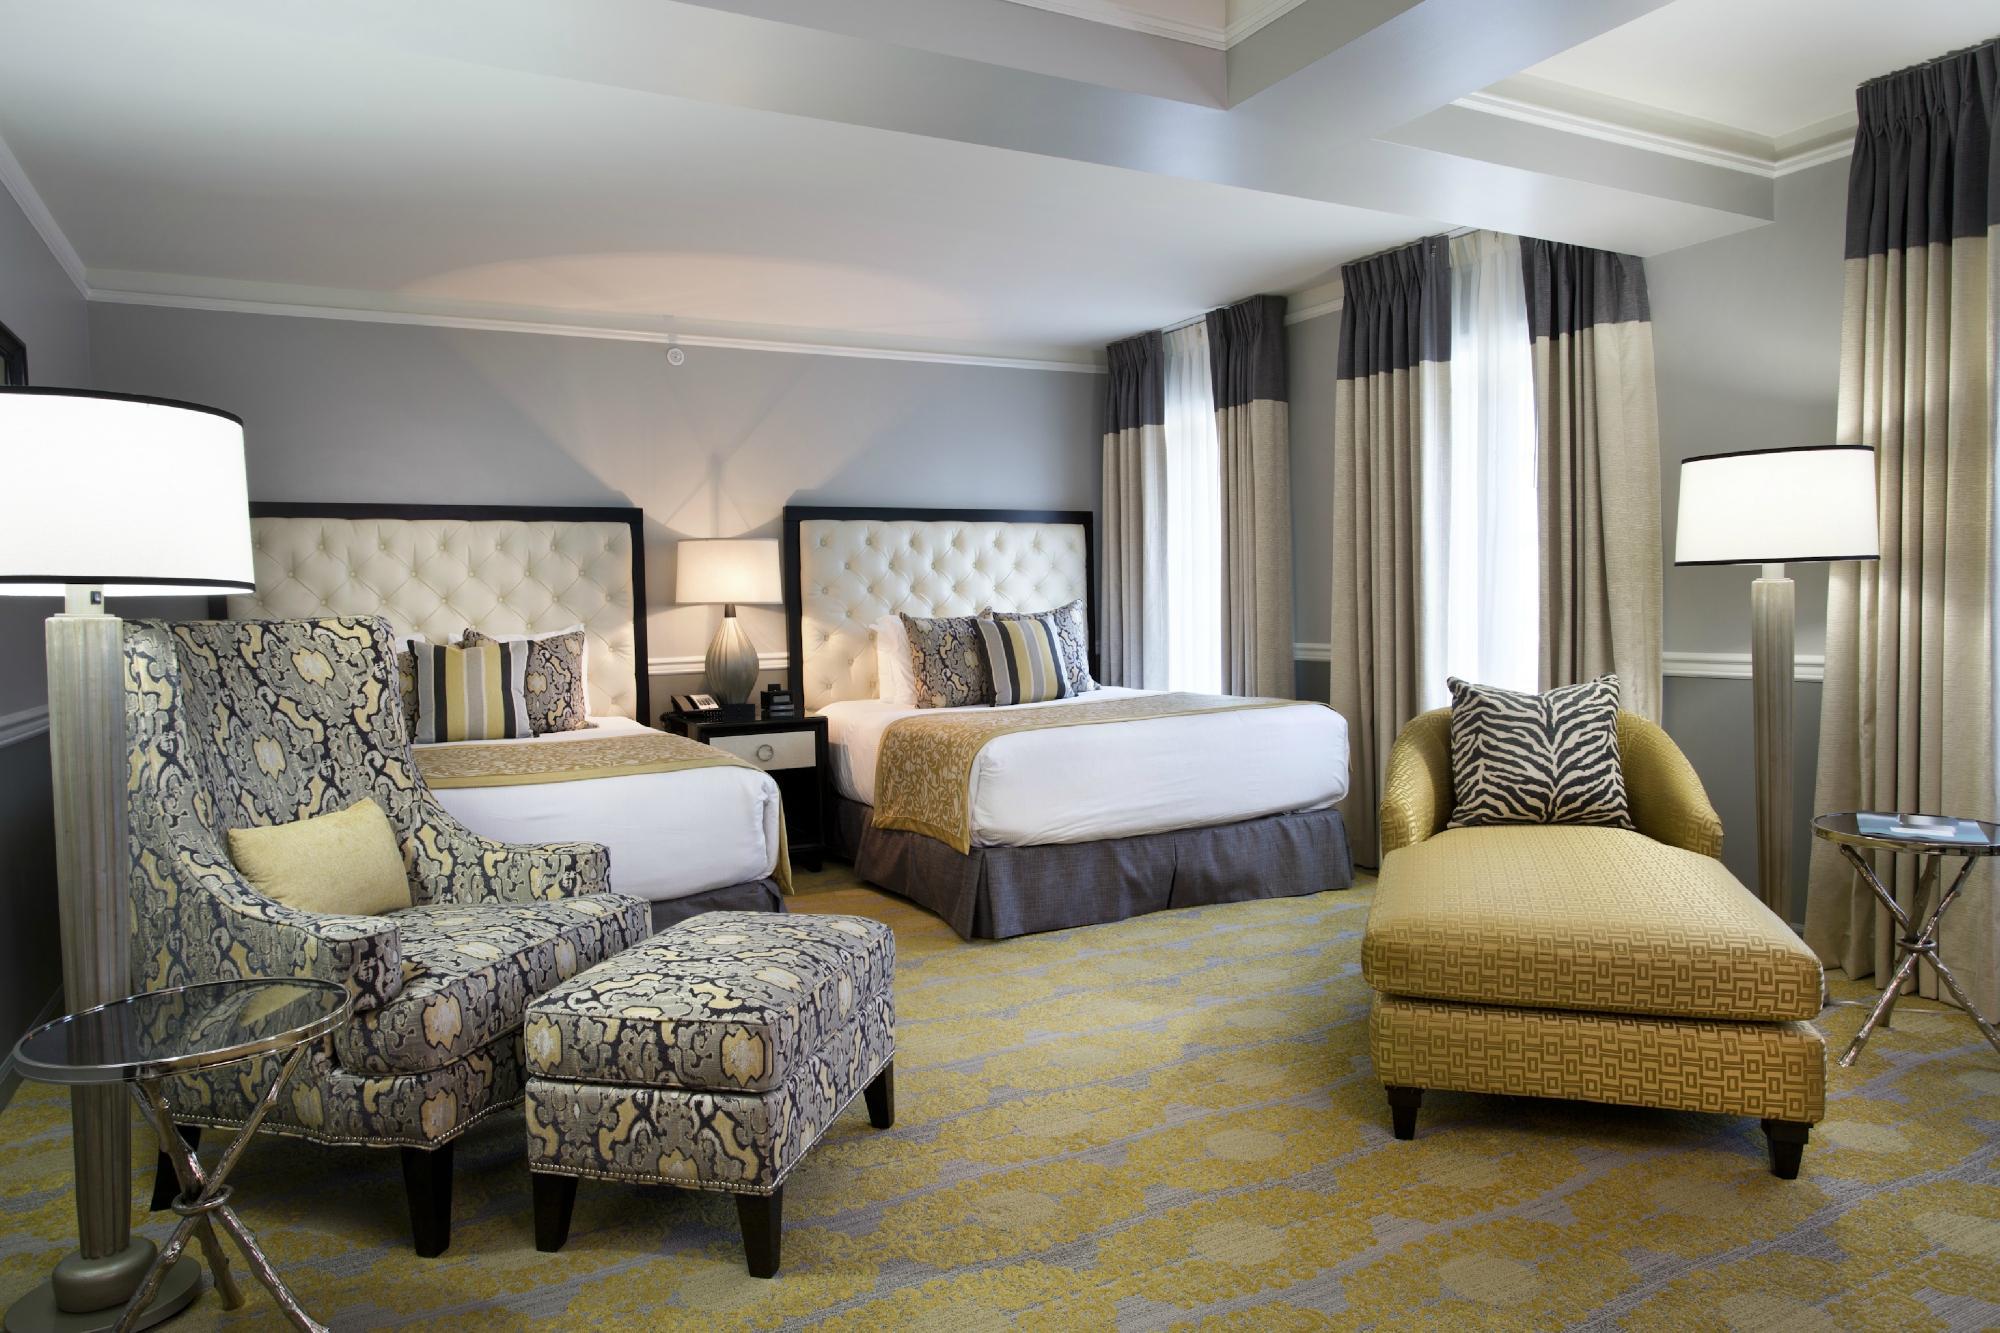 hotel bedroom lighting. Hotel Bedroom Lighting I